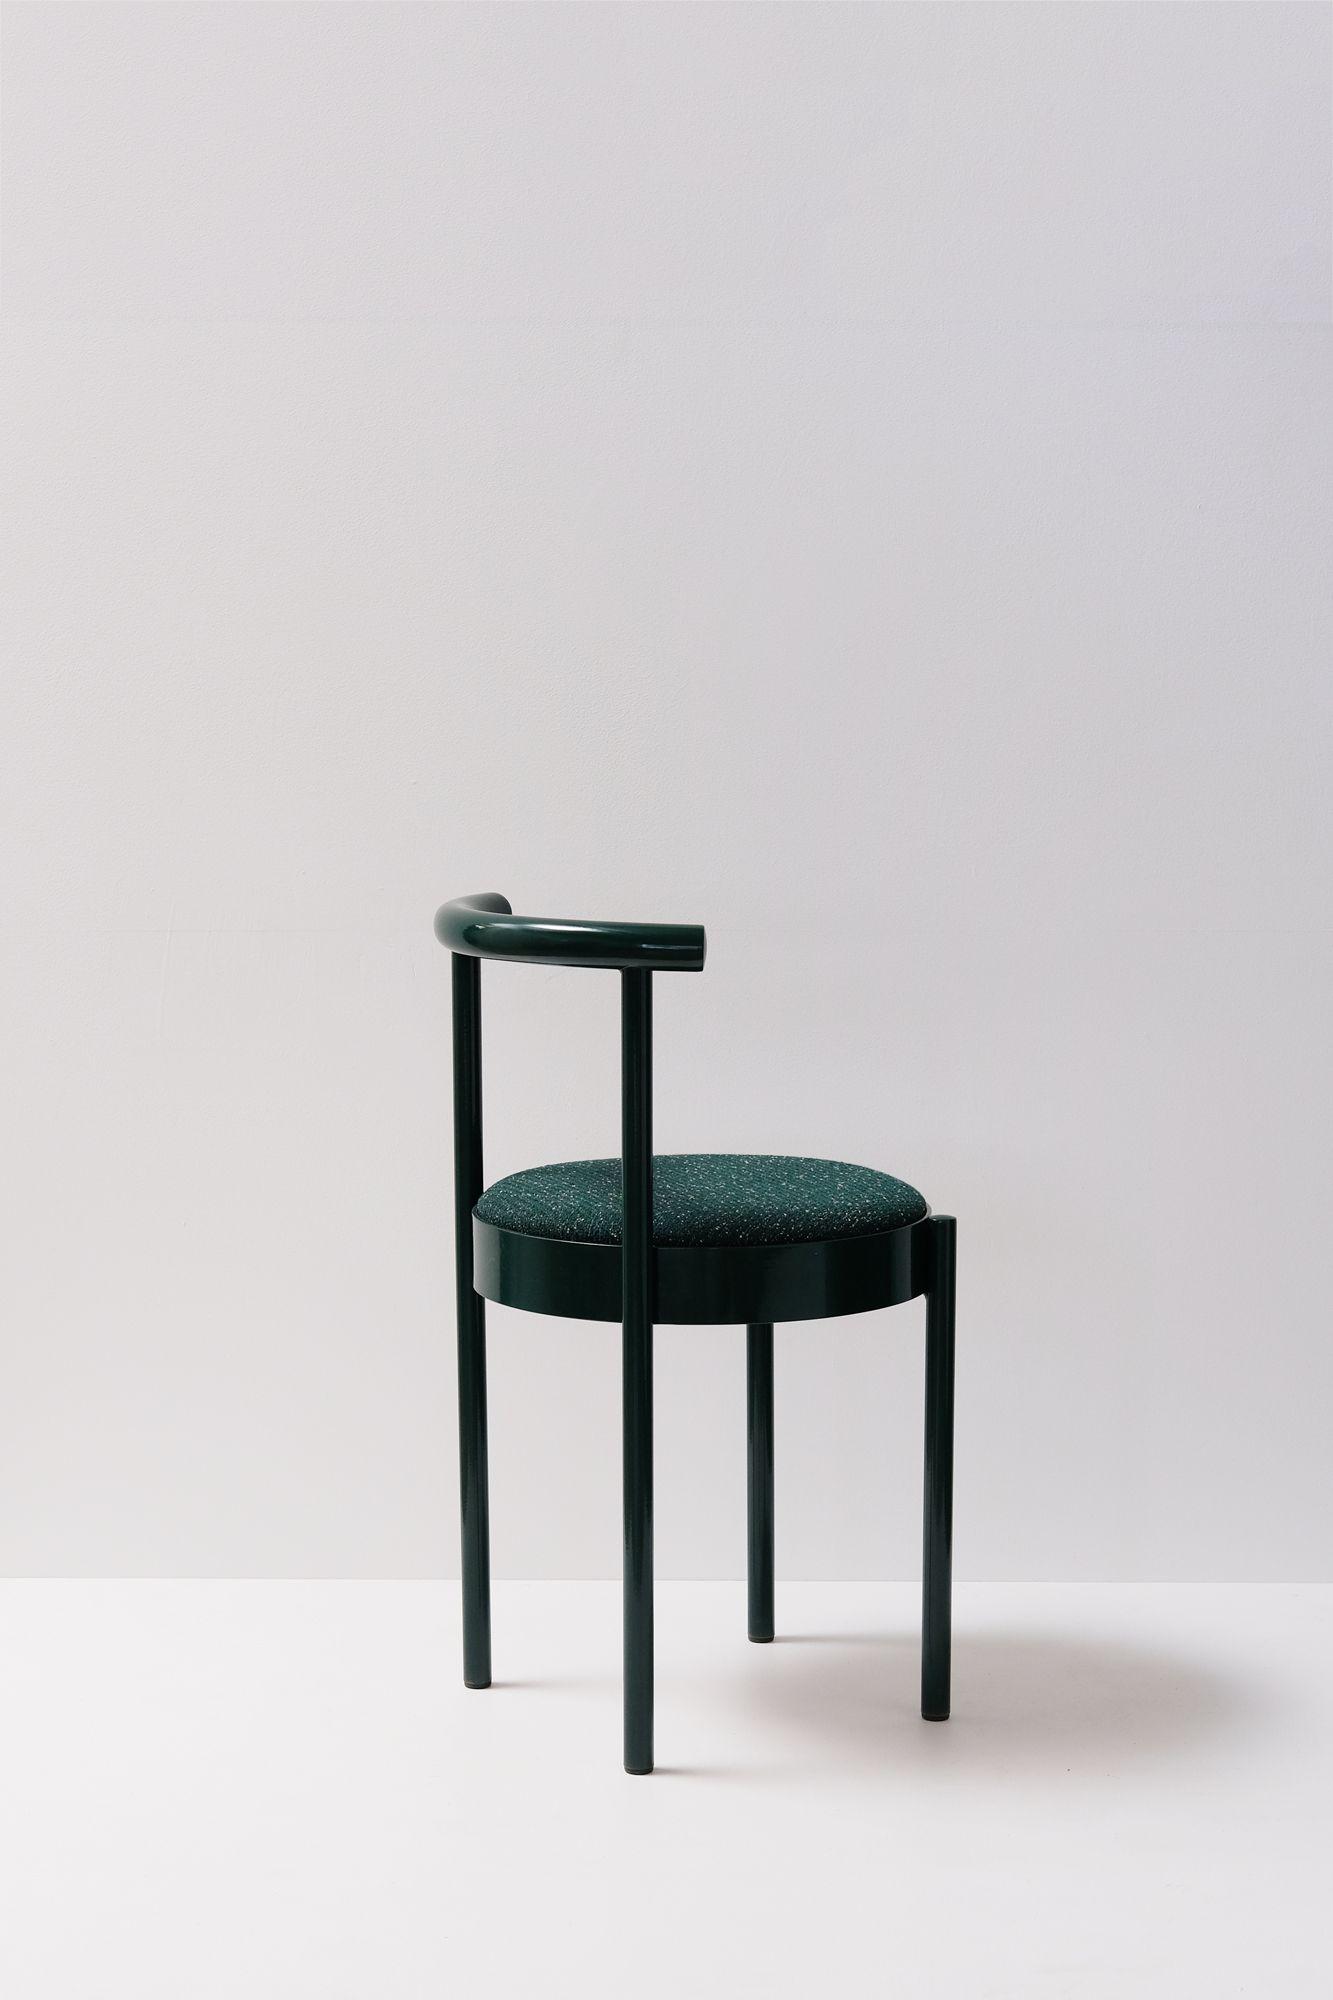 Soft Chair Is A Minimalist Chair Created By Australia Based Designers  Daniel Emma.